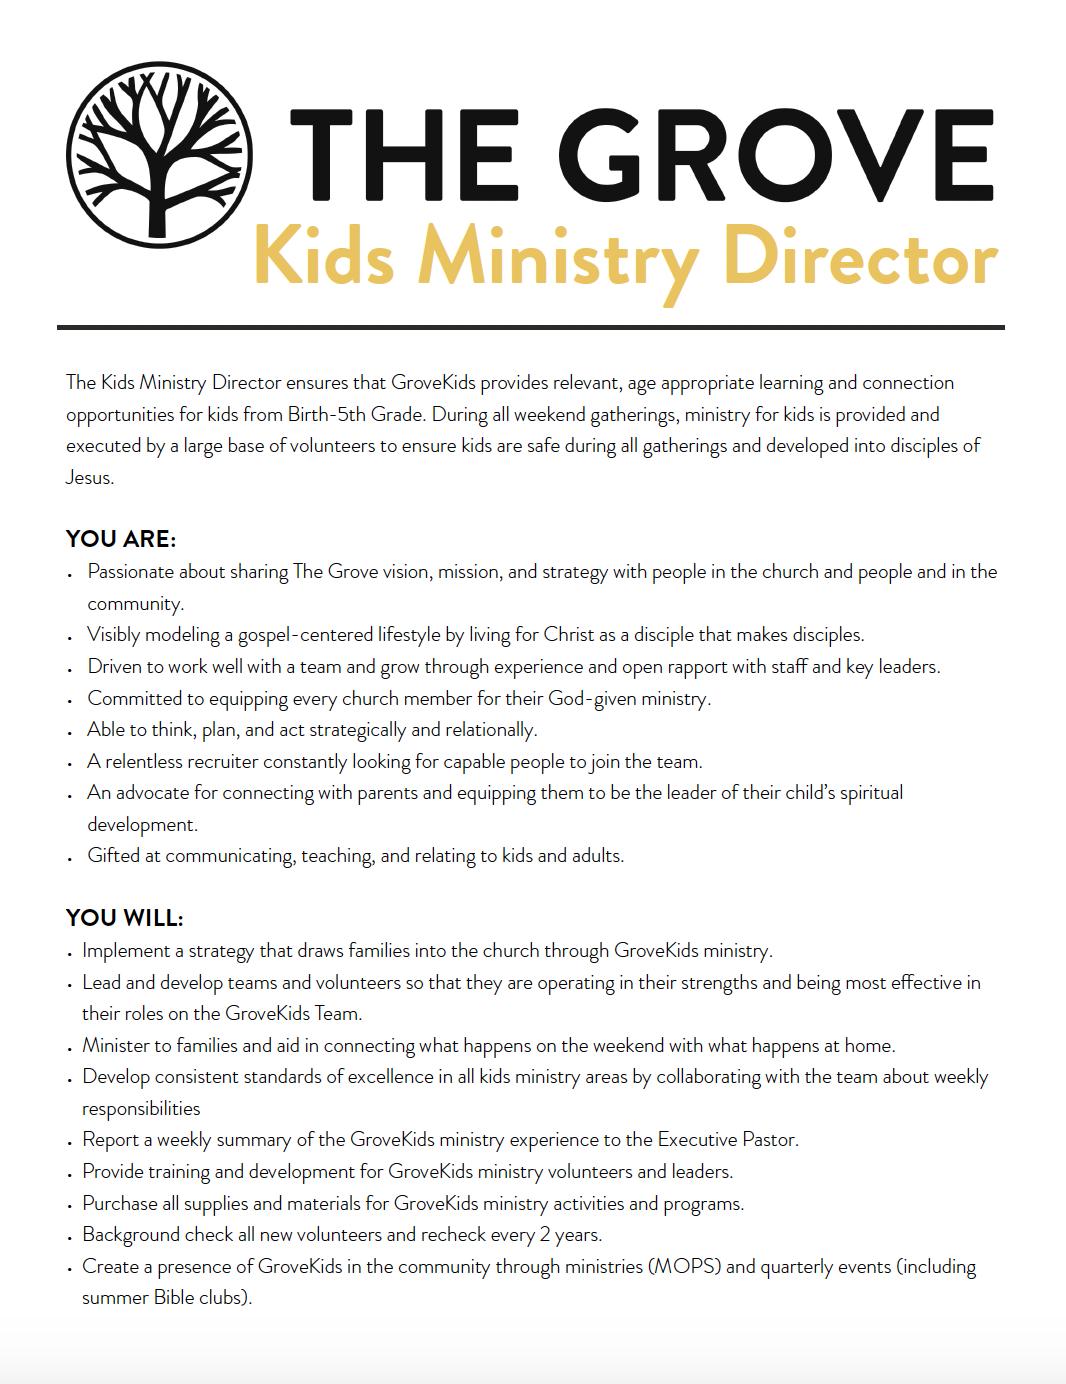 The Grove Kids Ministry Director Job Description.png